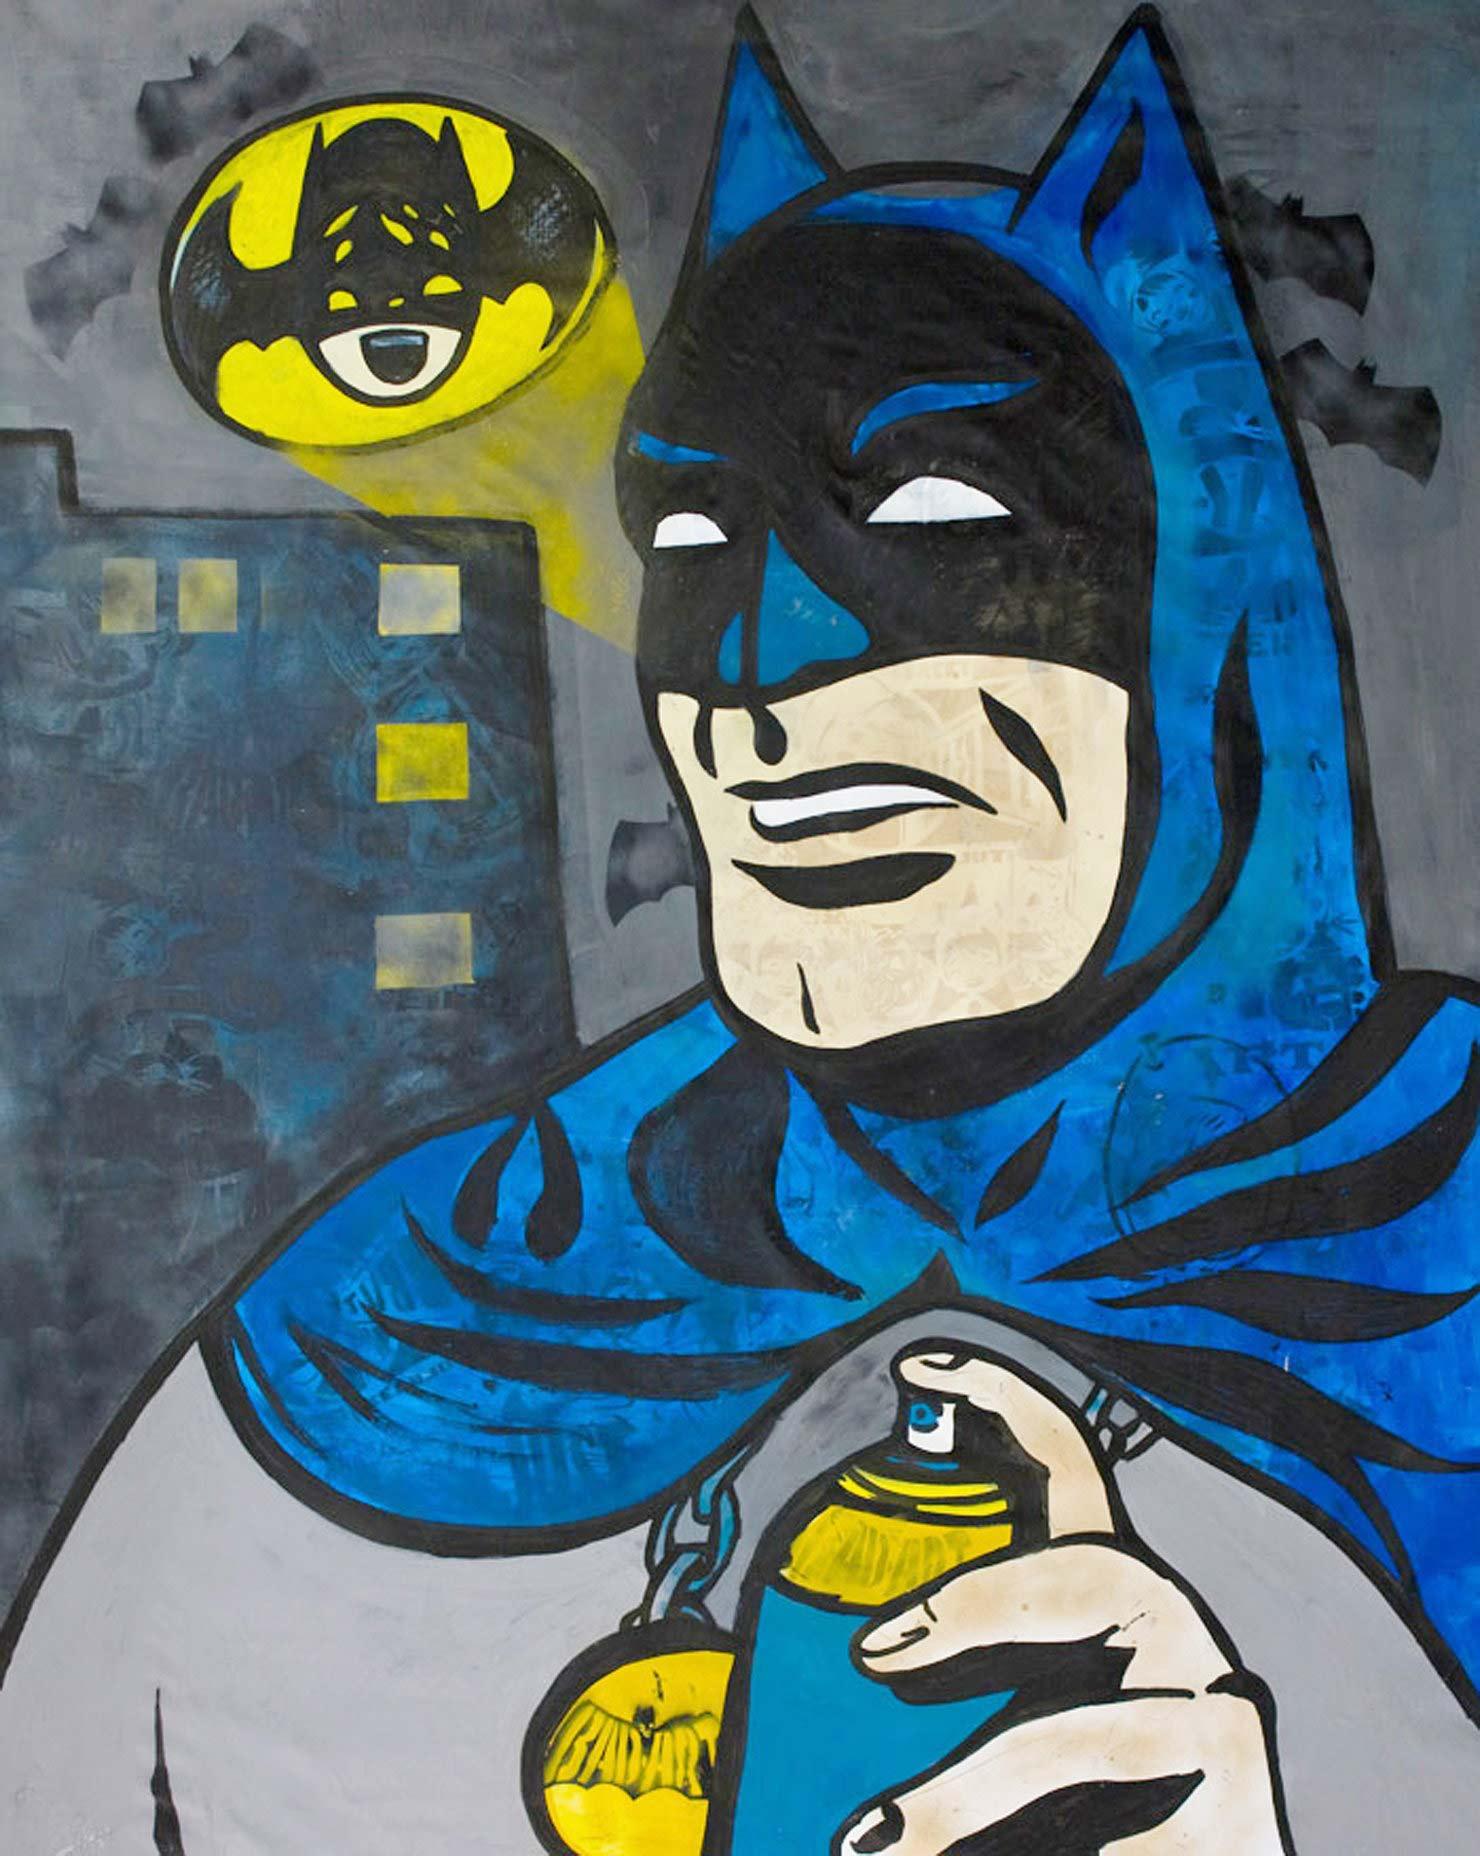 Night Art Bad Art - TV Boy